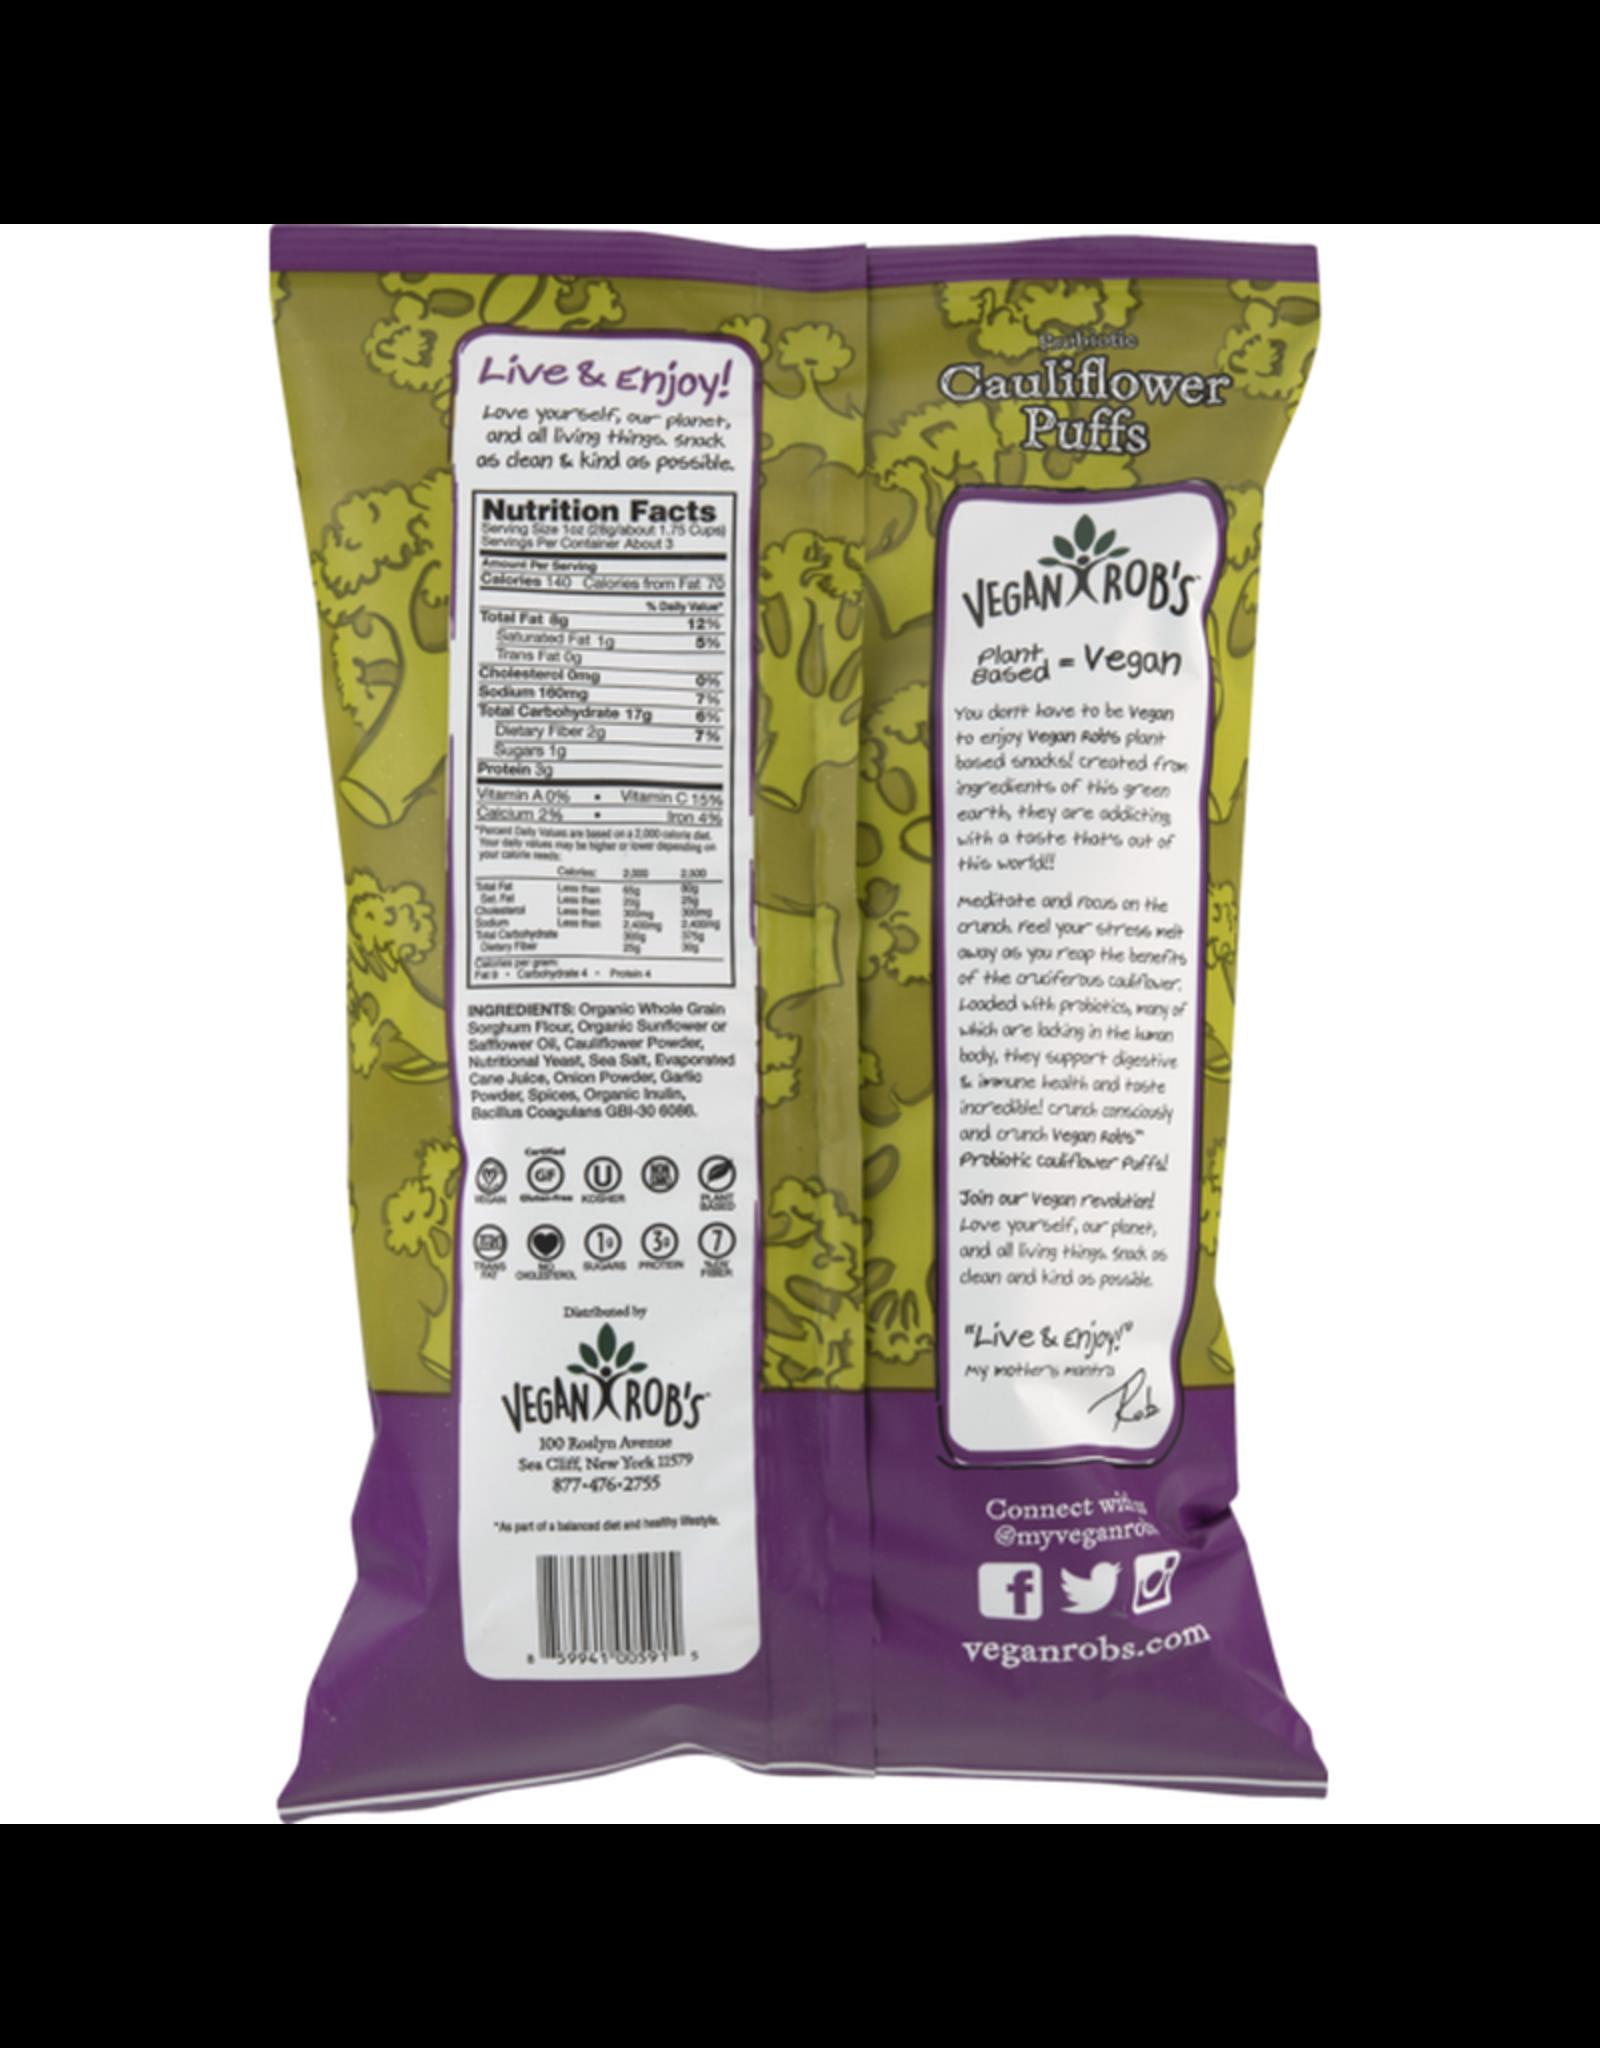 Bonberi VeganRobs Cauliflower Puffs